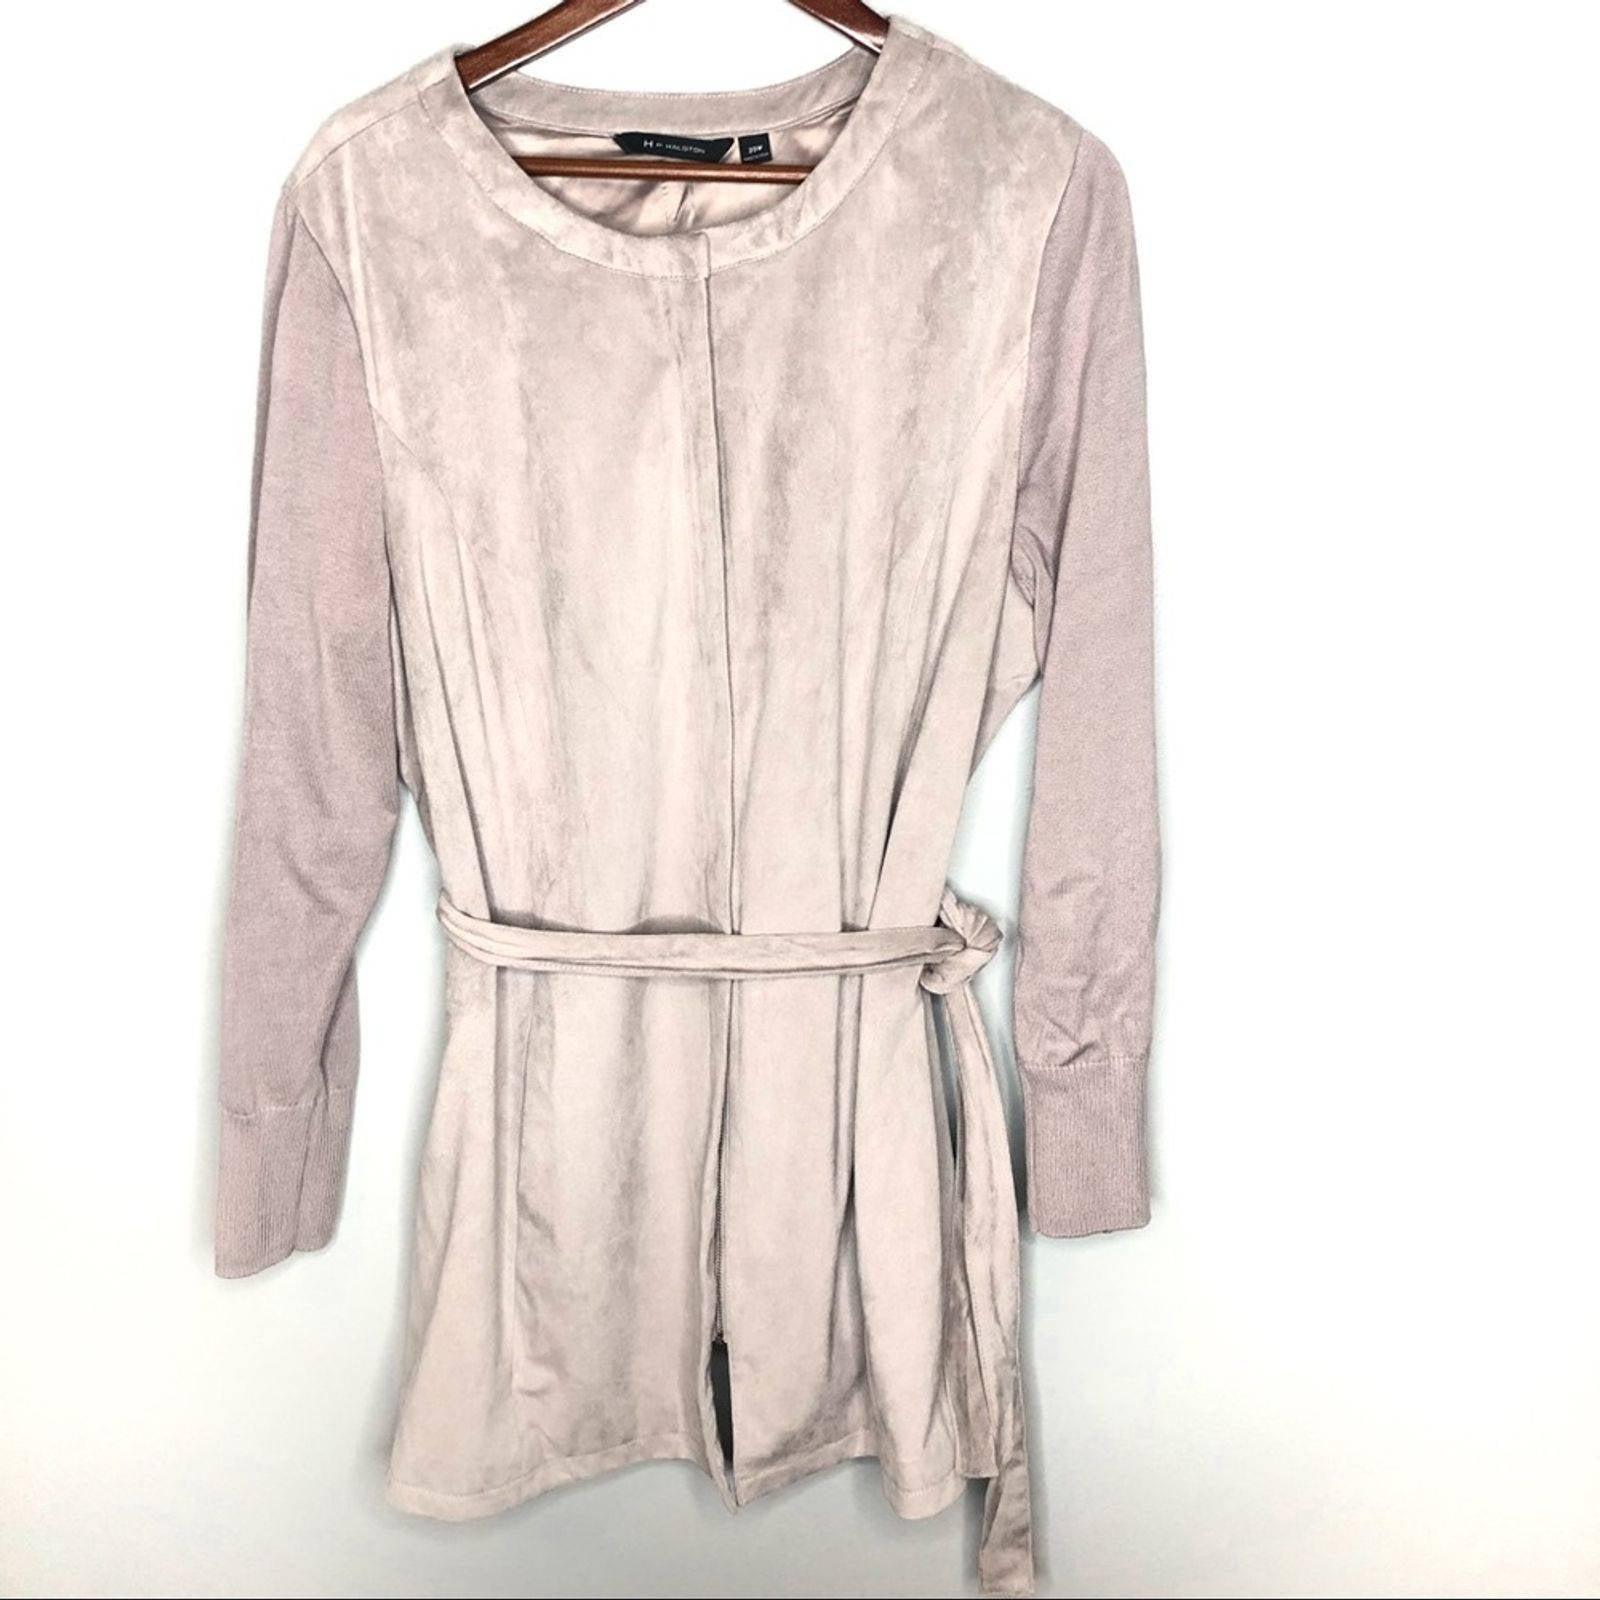 H by Halston plus size faux suede jacket